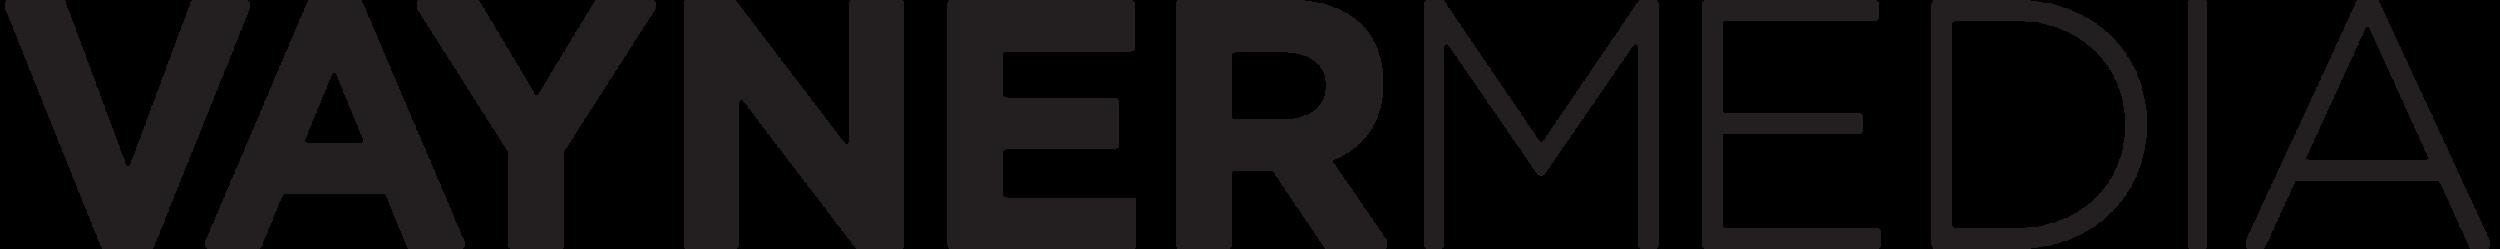 logo-vaynermedia-1.png